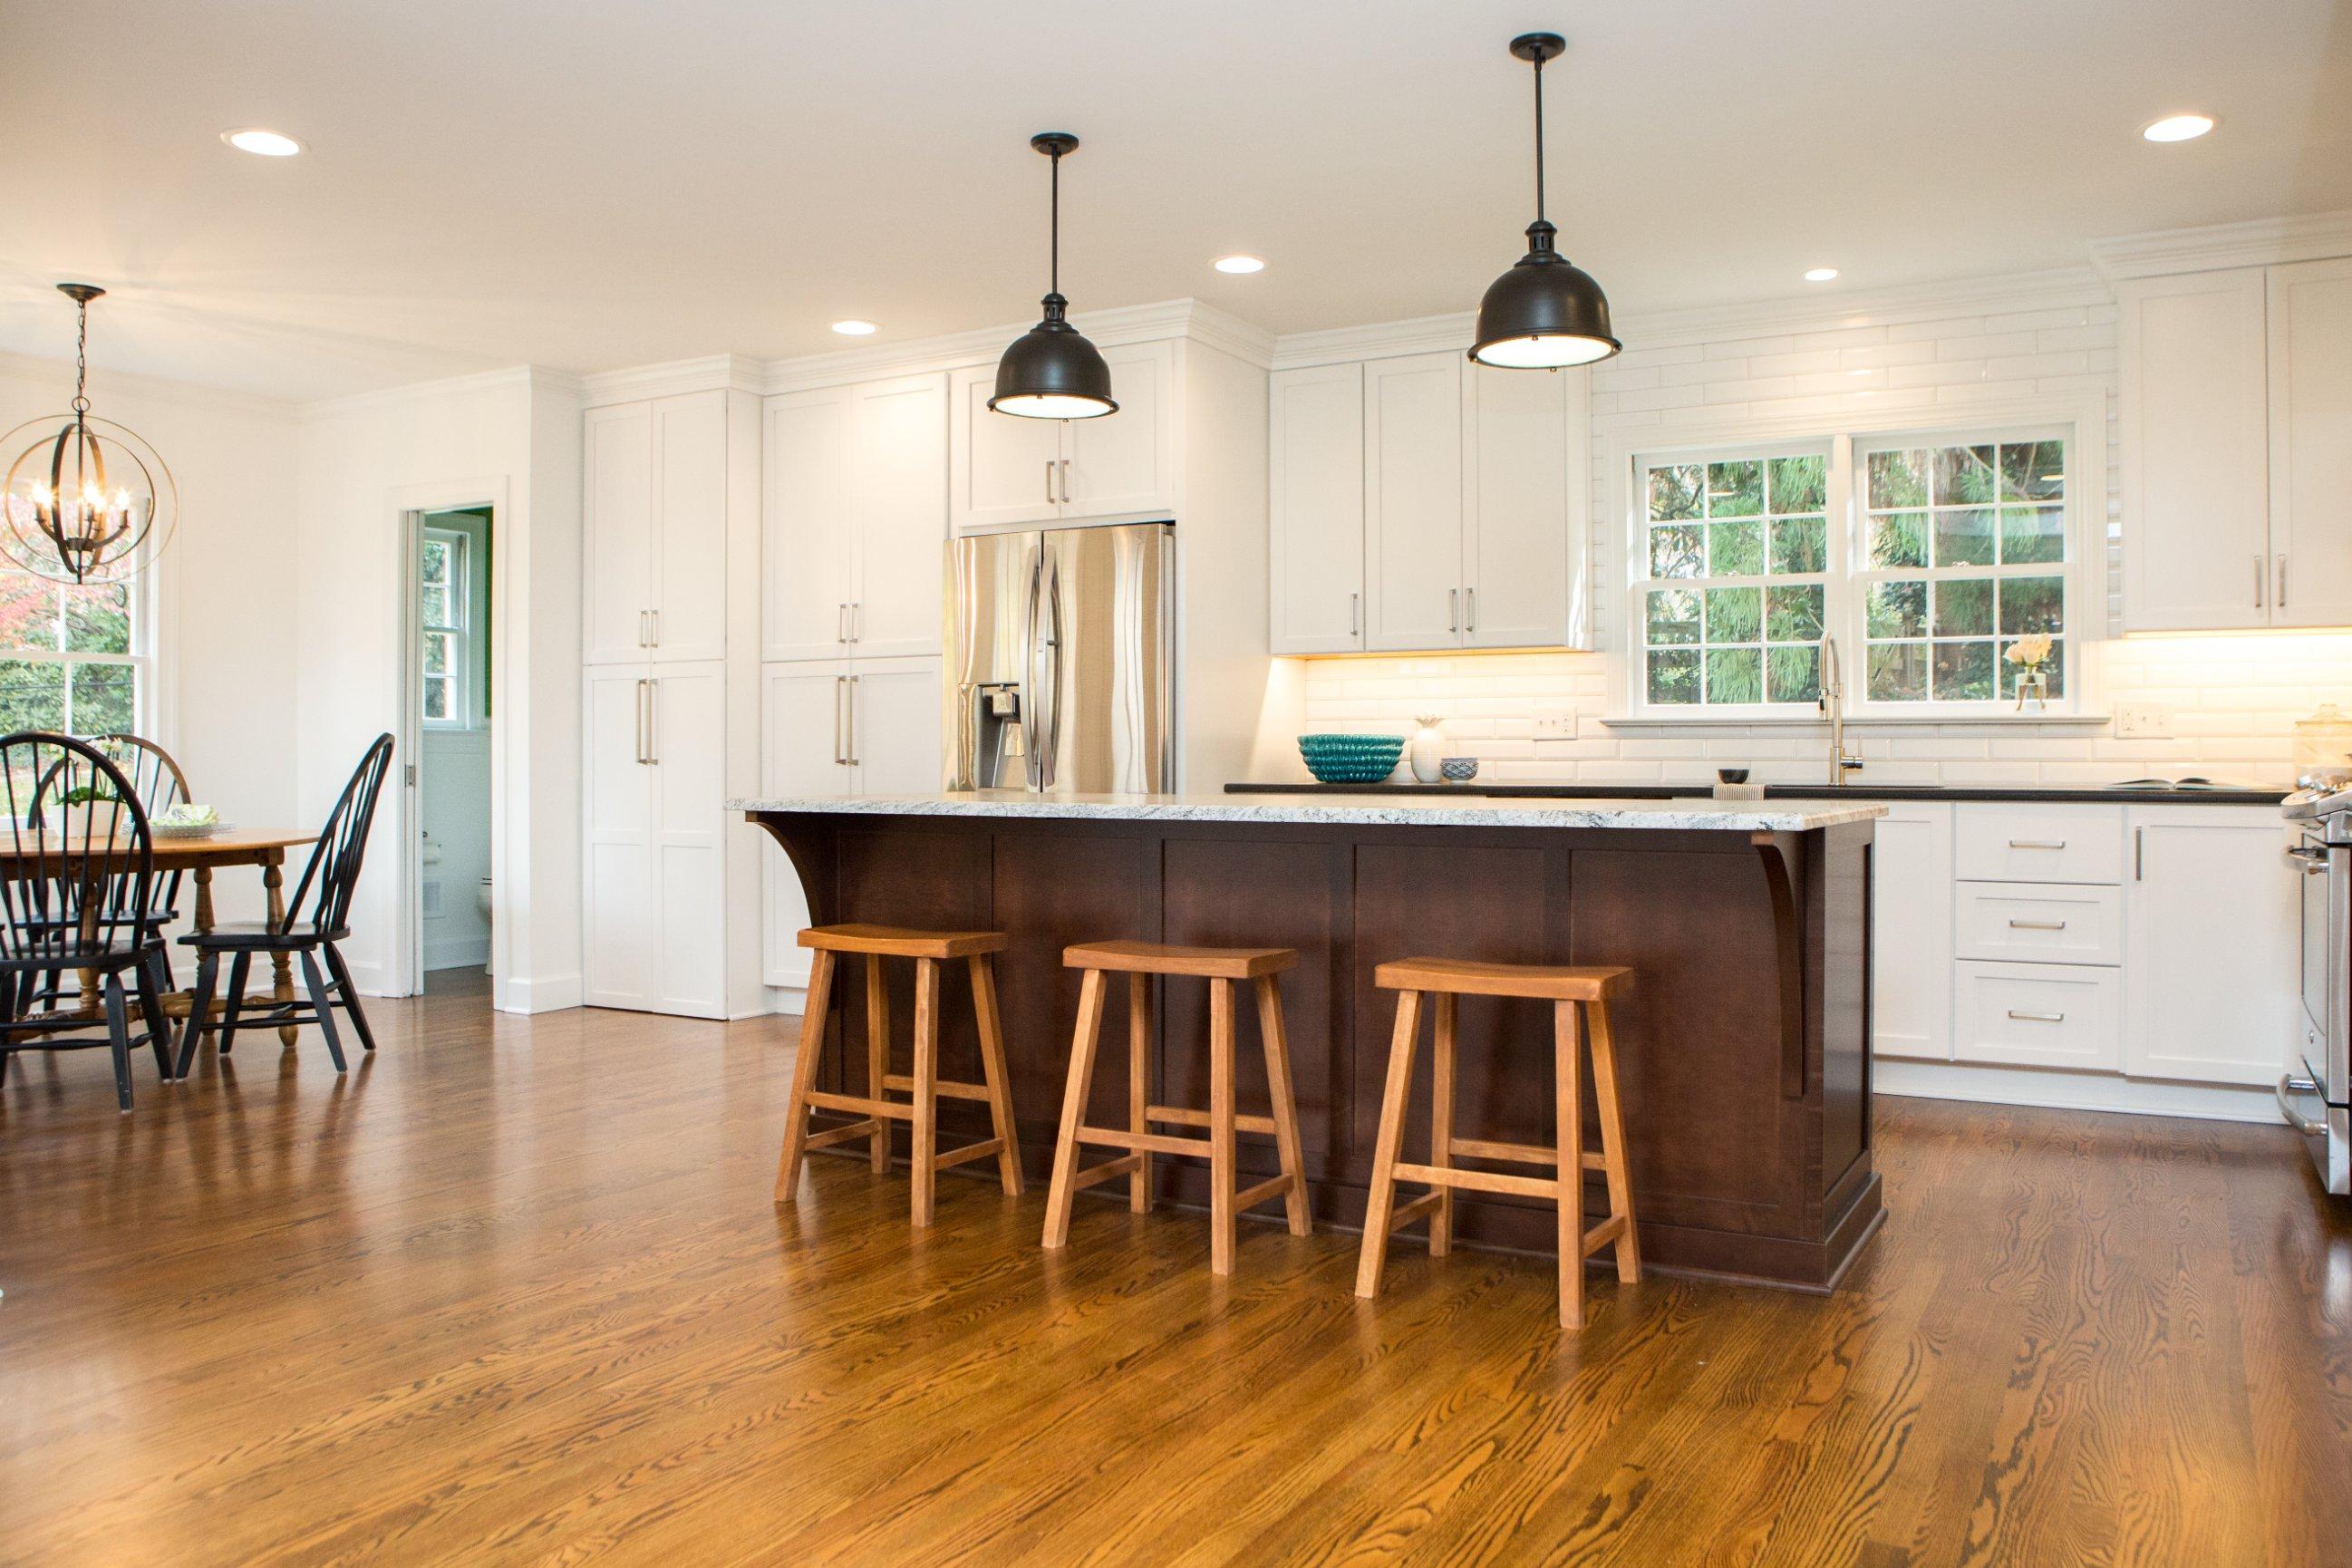 Premier Kitchen And Bath | Winston Salem S Premier Kitchen And Bath Home Improvement Company